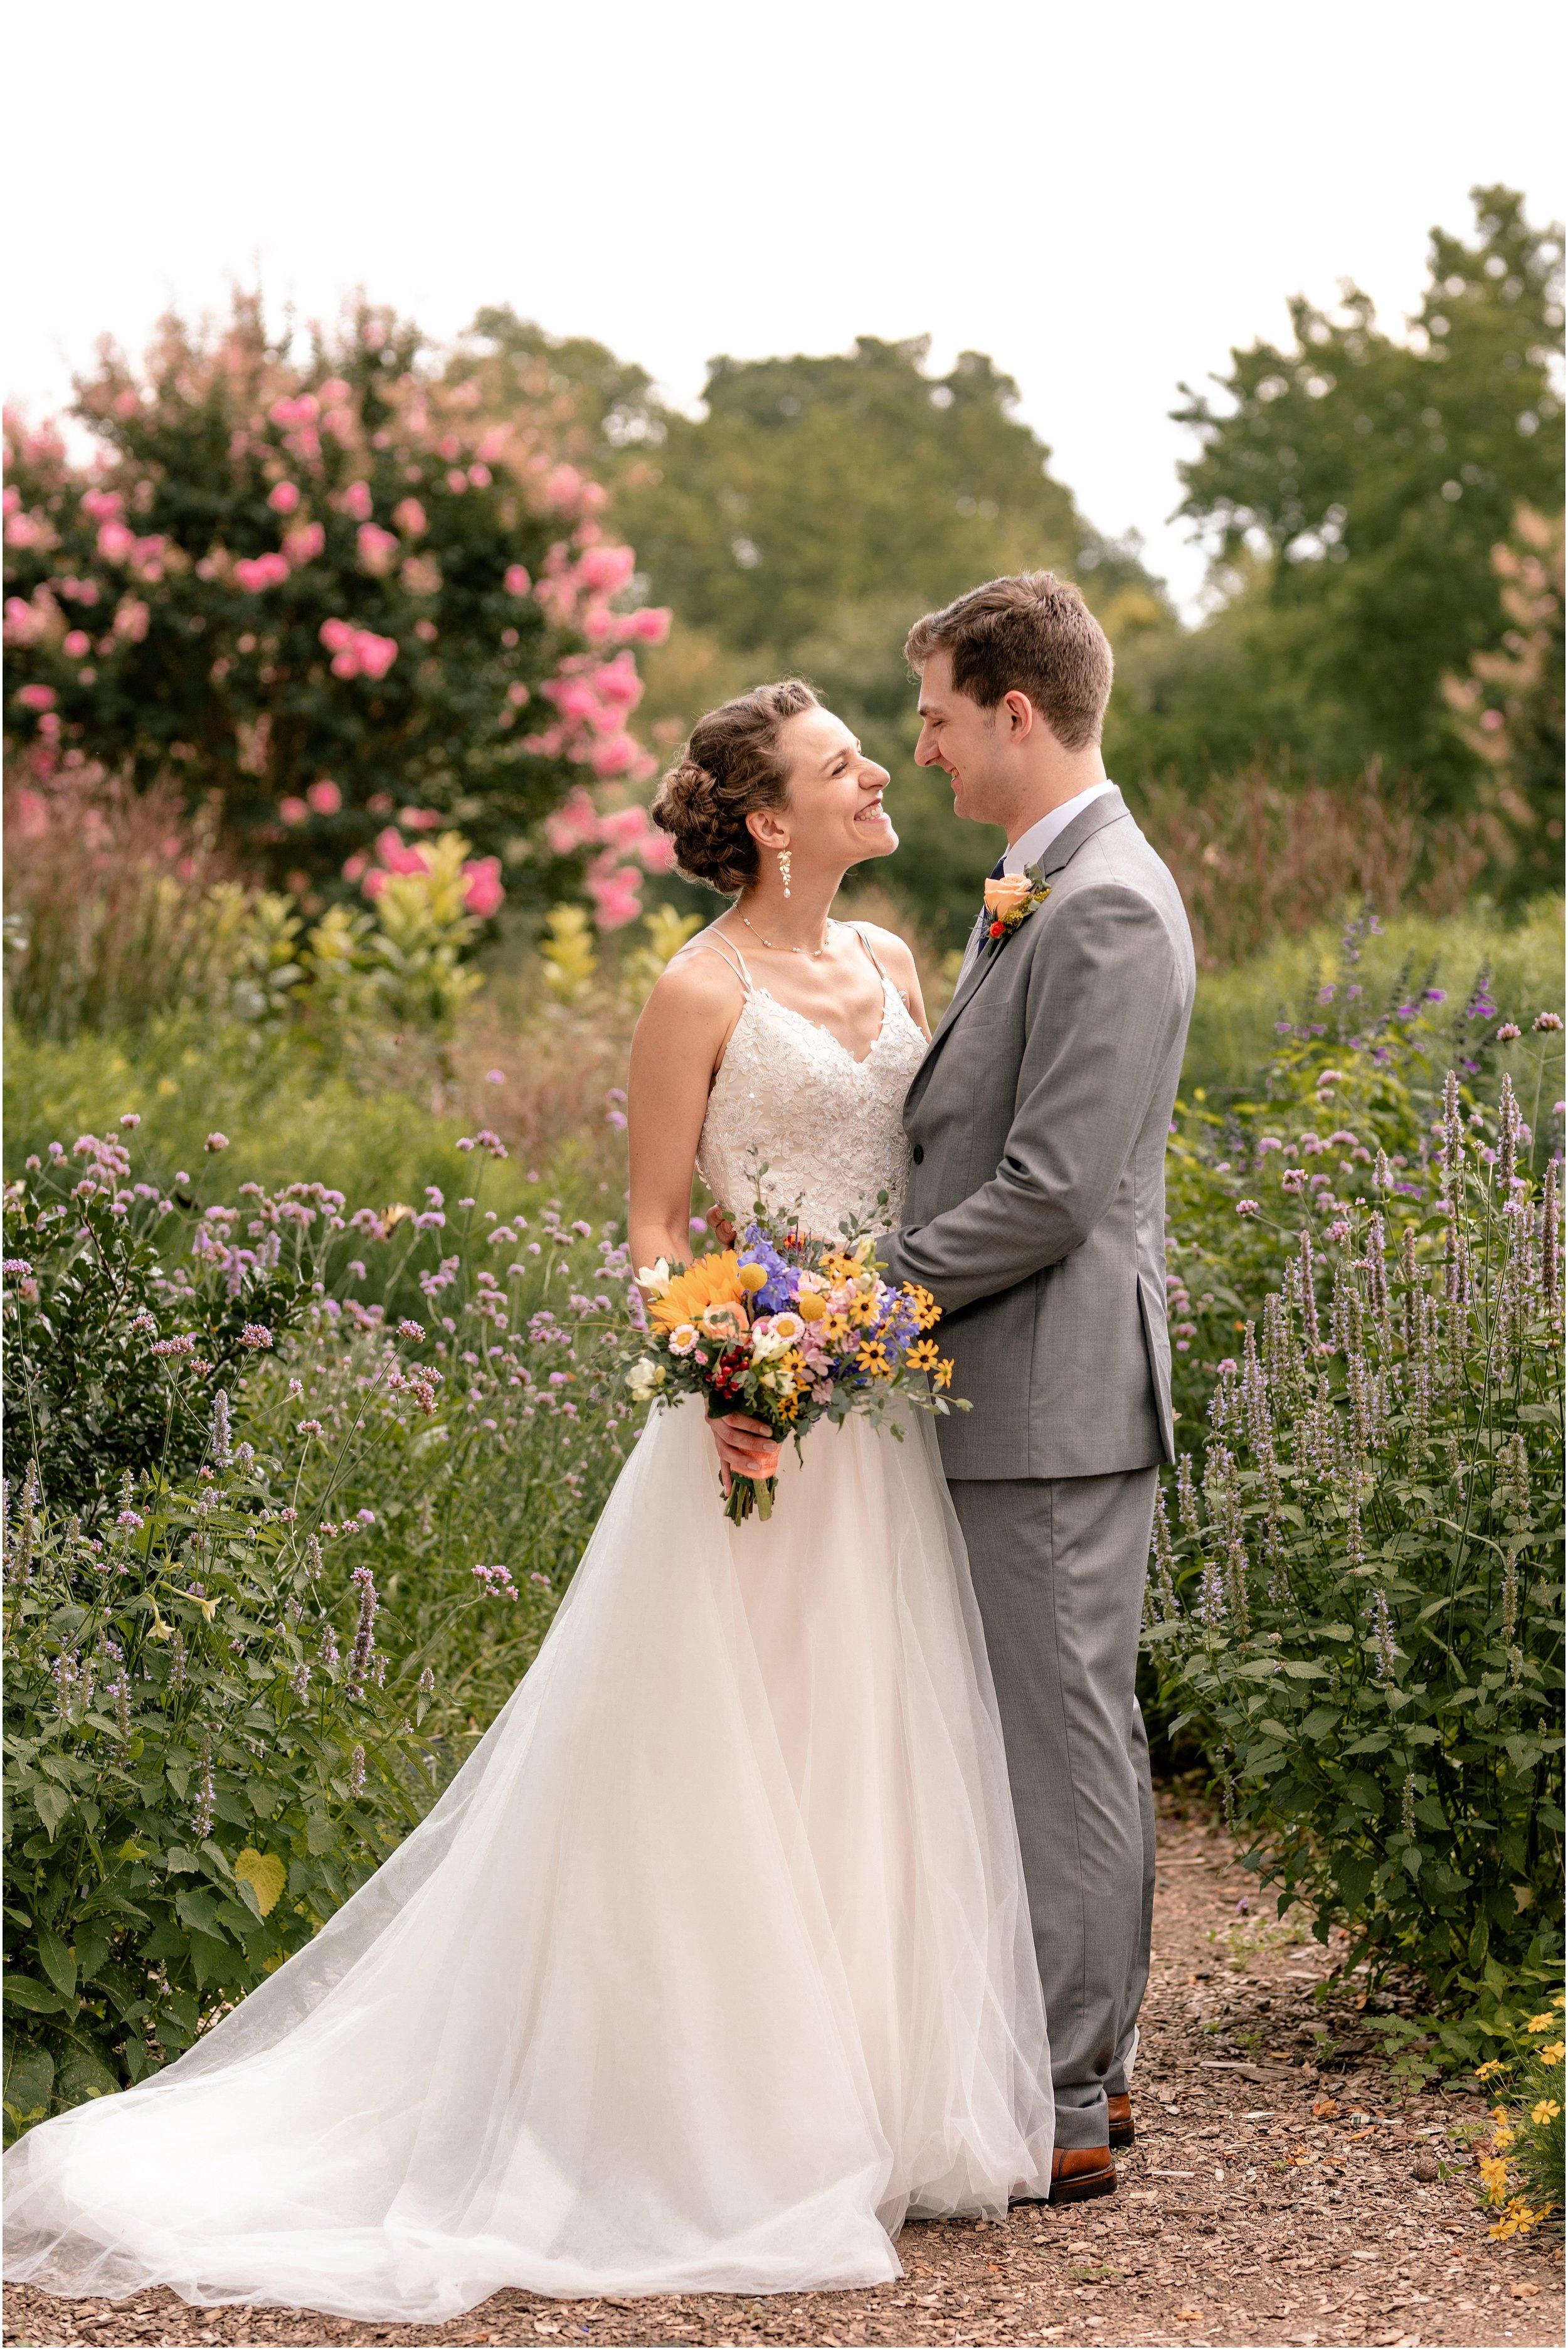 hannah leigh photography Cylburn Arboretum Wedding Baltimore, MD_3417.jpg